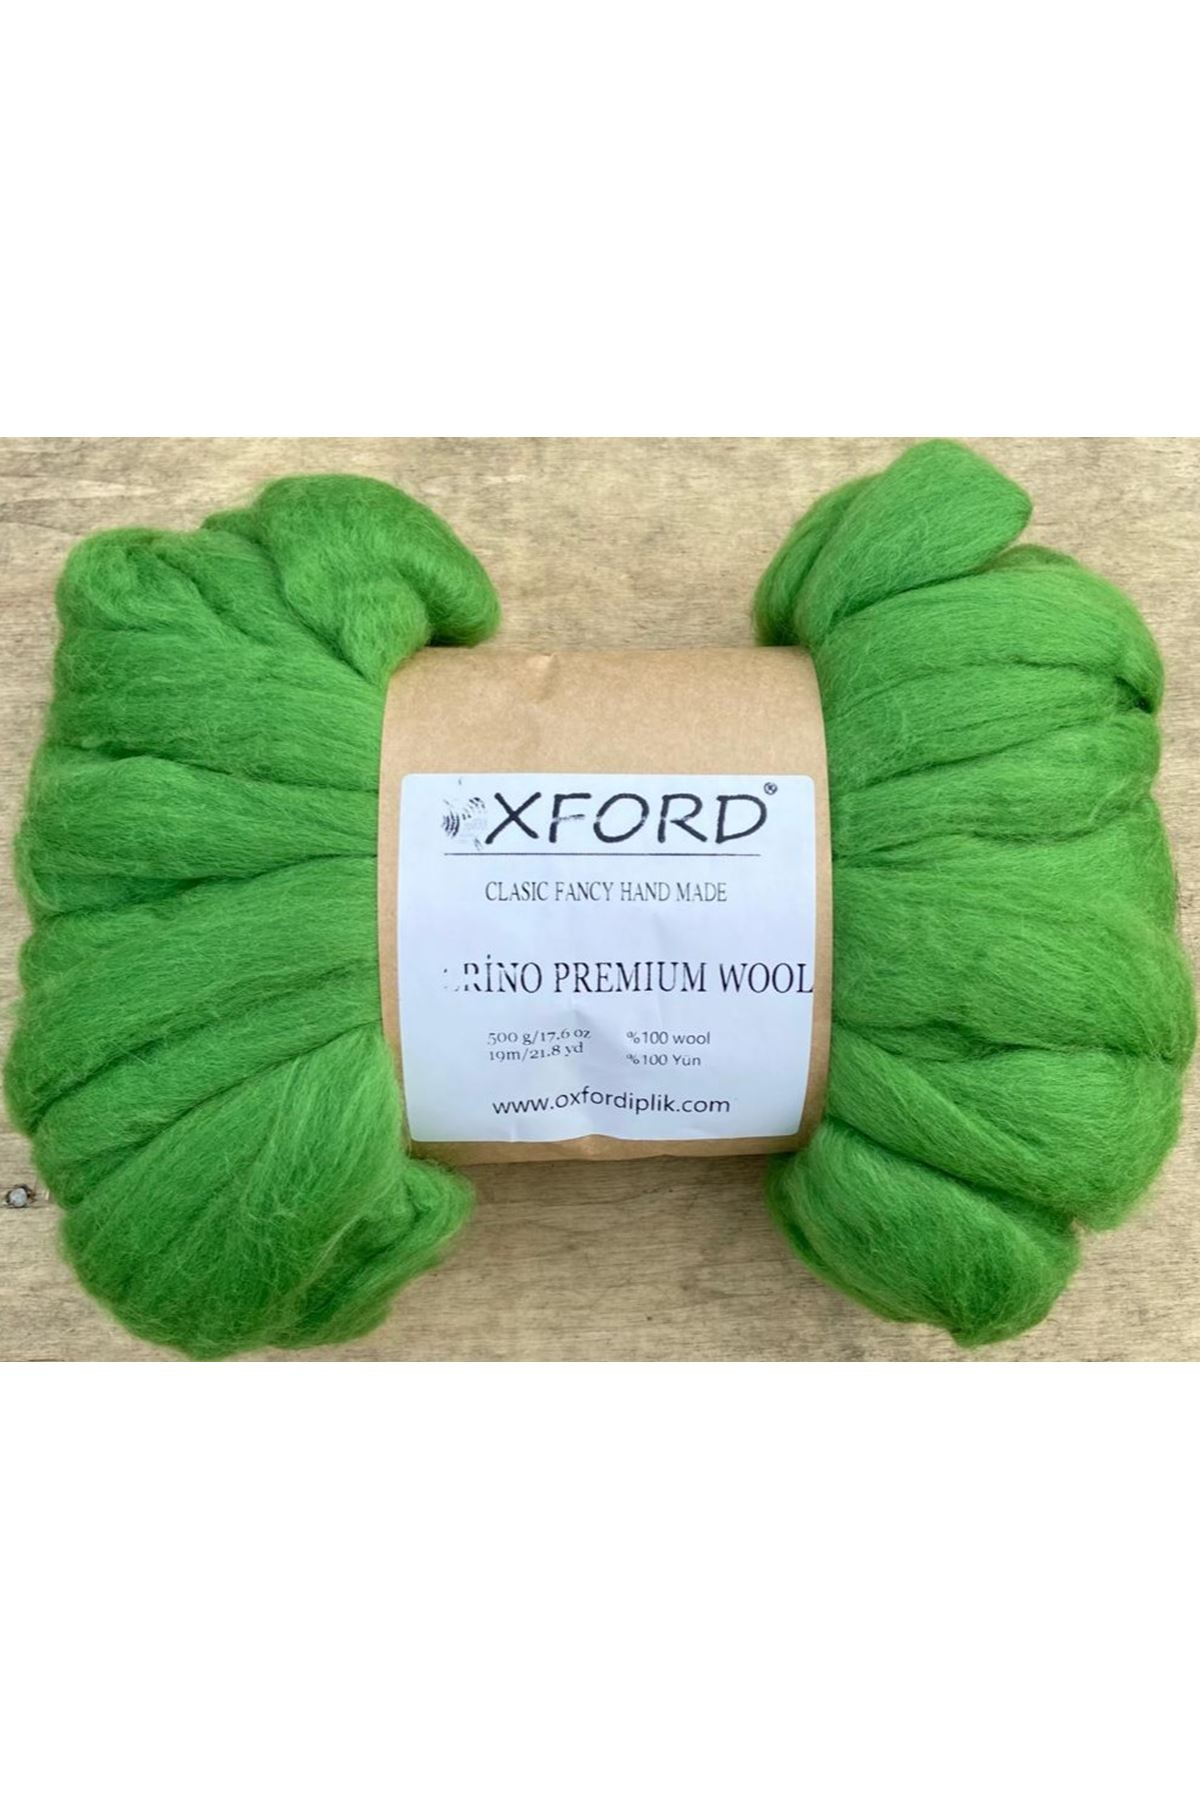 Oxford Merino Premium Wool 15 - Yeşil